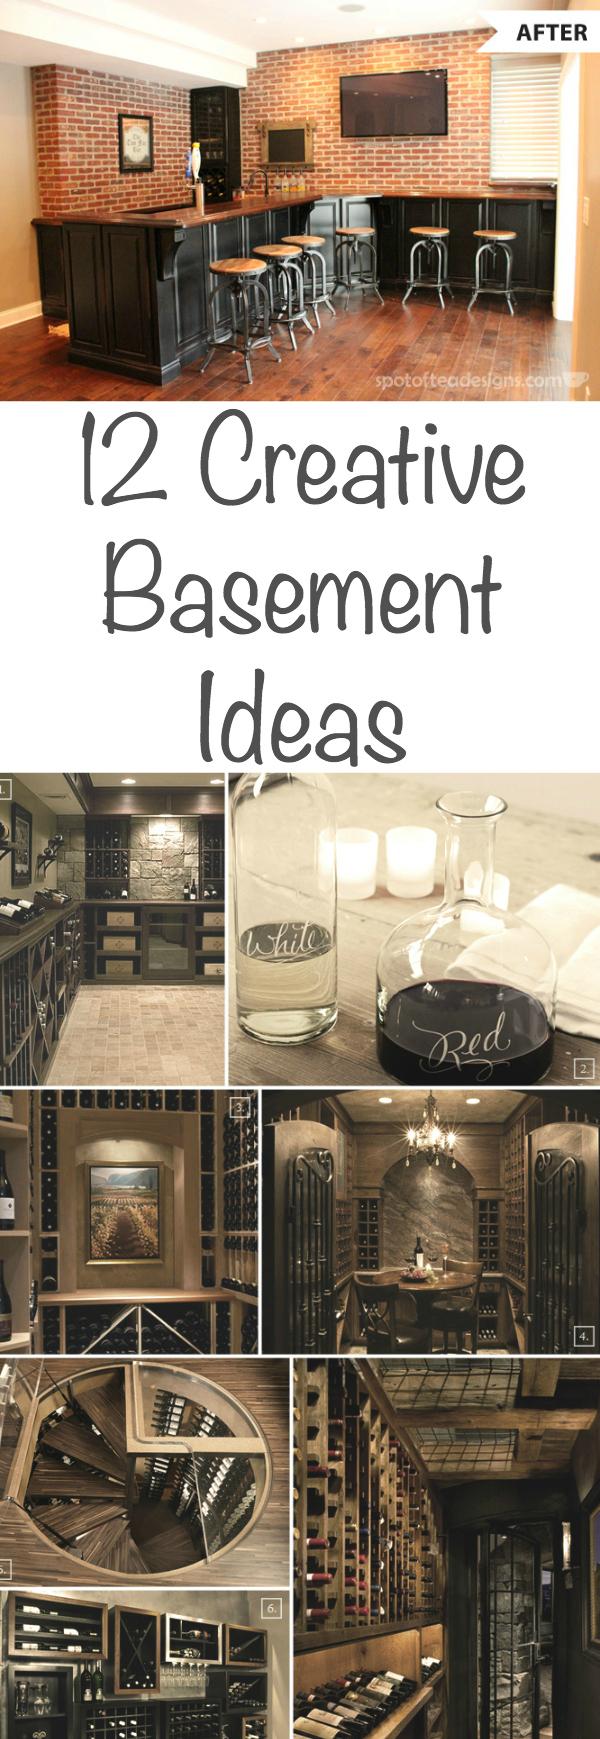 12 Creative Basement Ideas